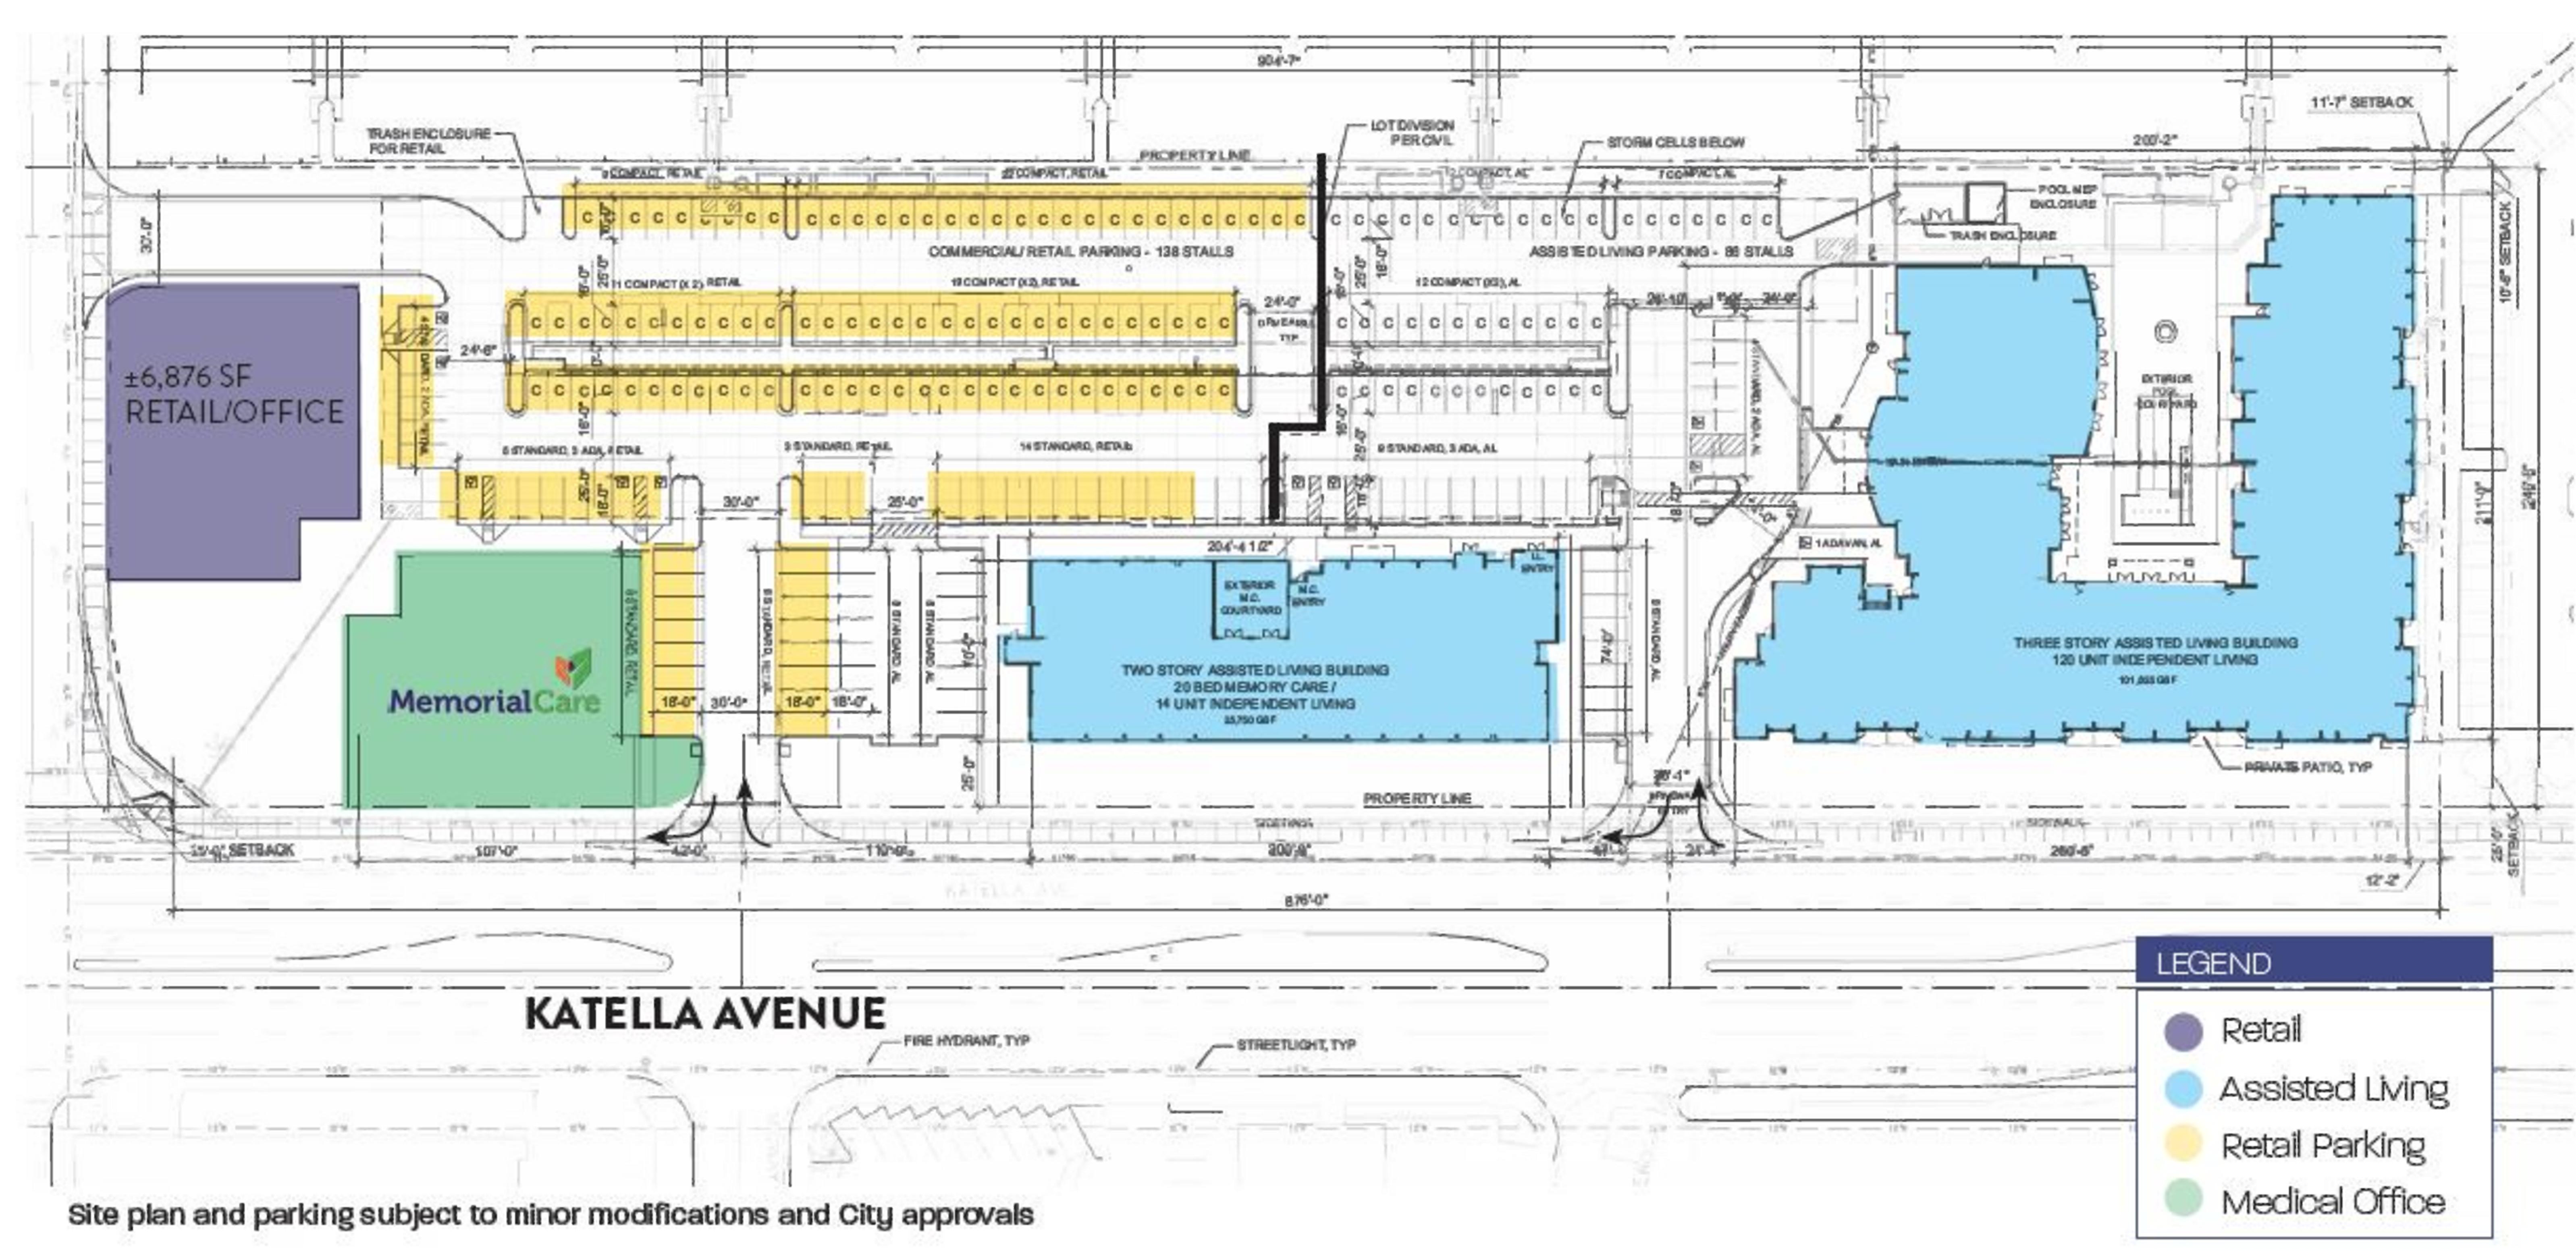 Barton Place Retail: site plan